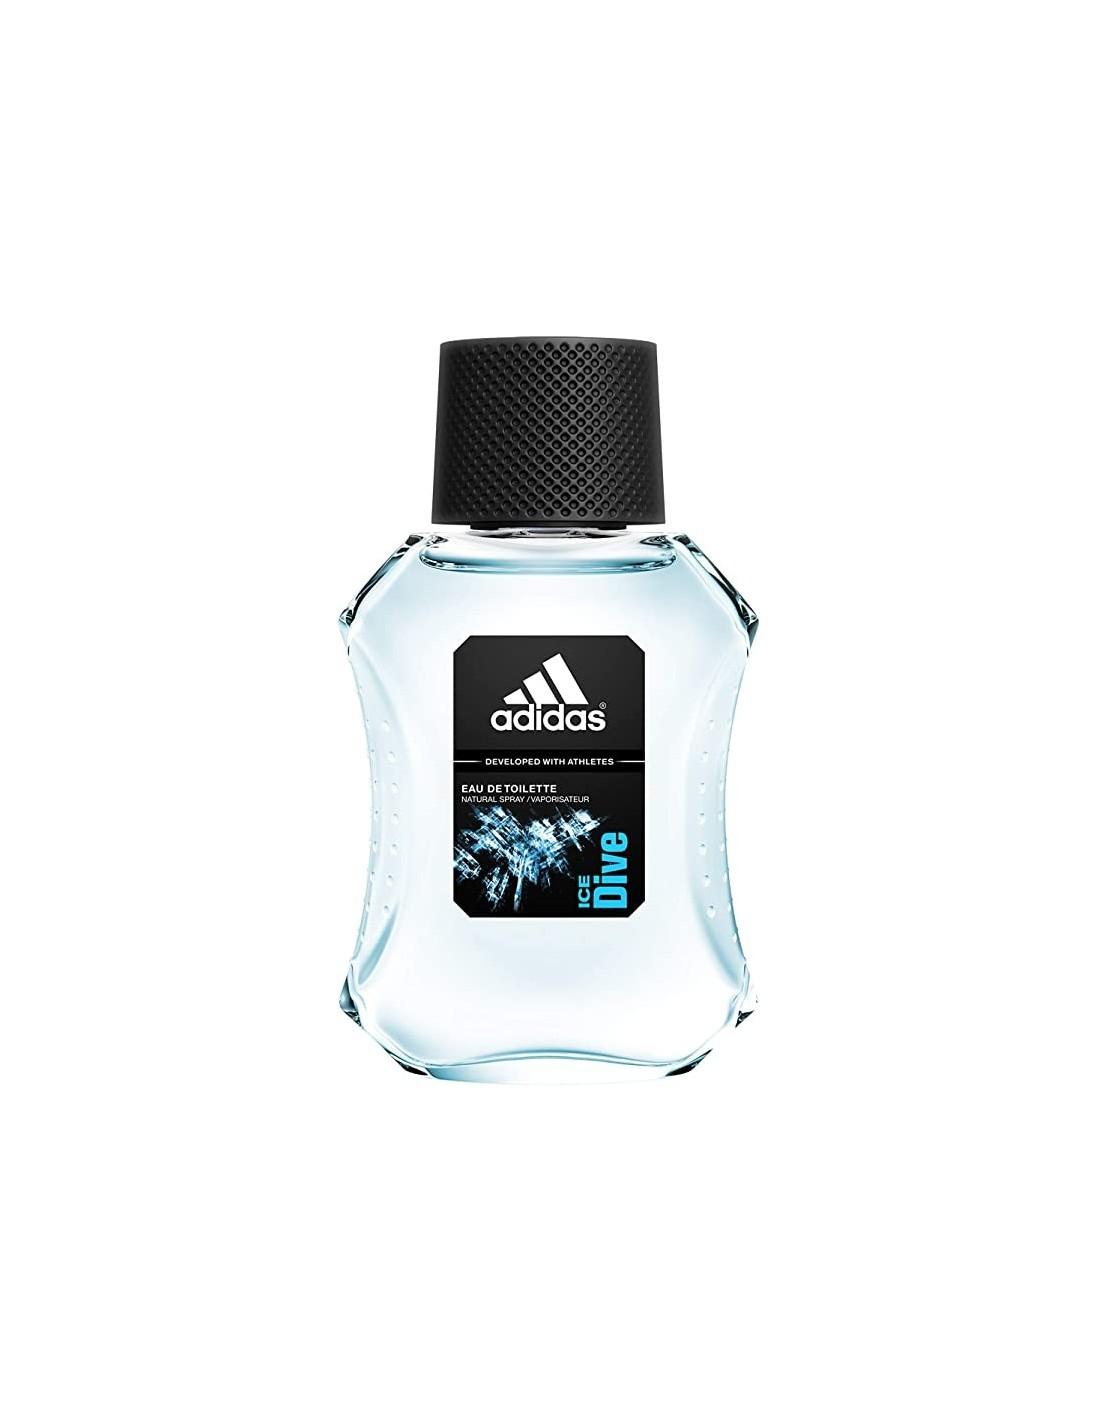 profumo adidas uomo prezzo